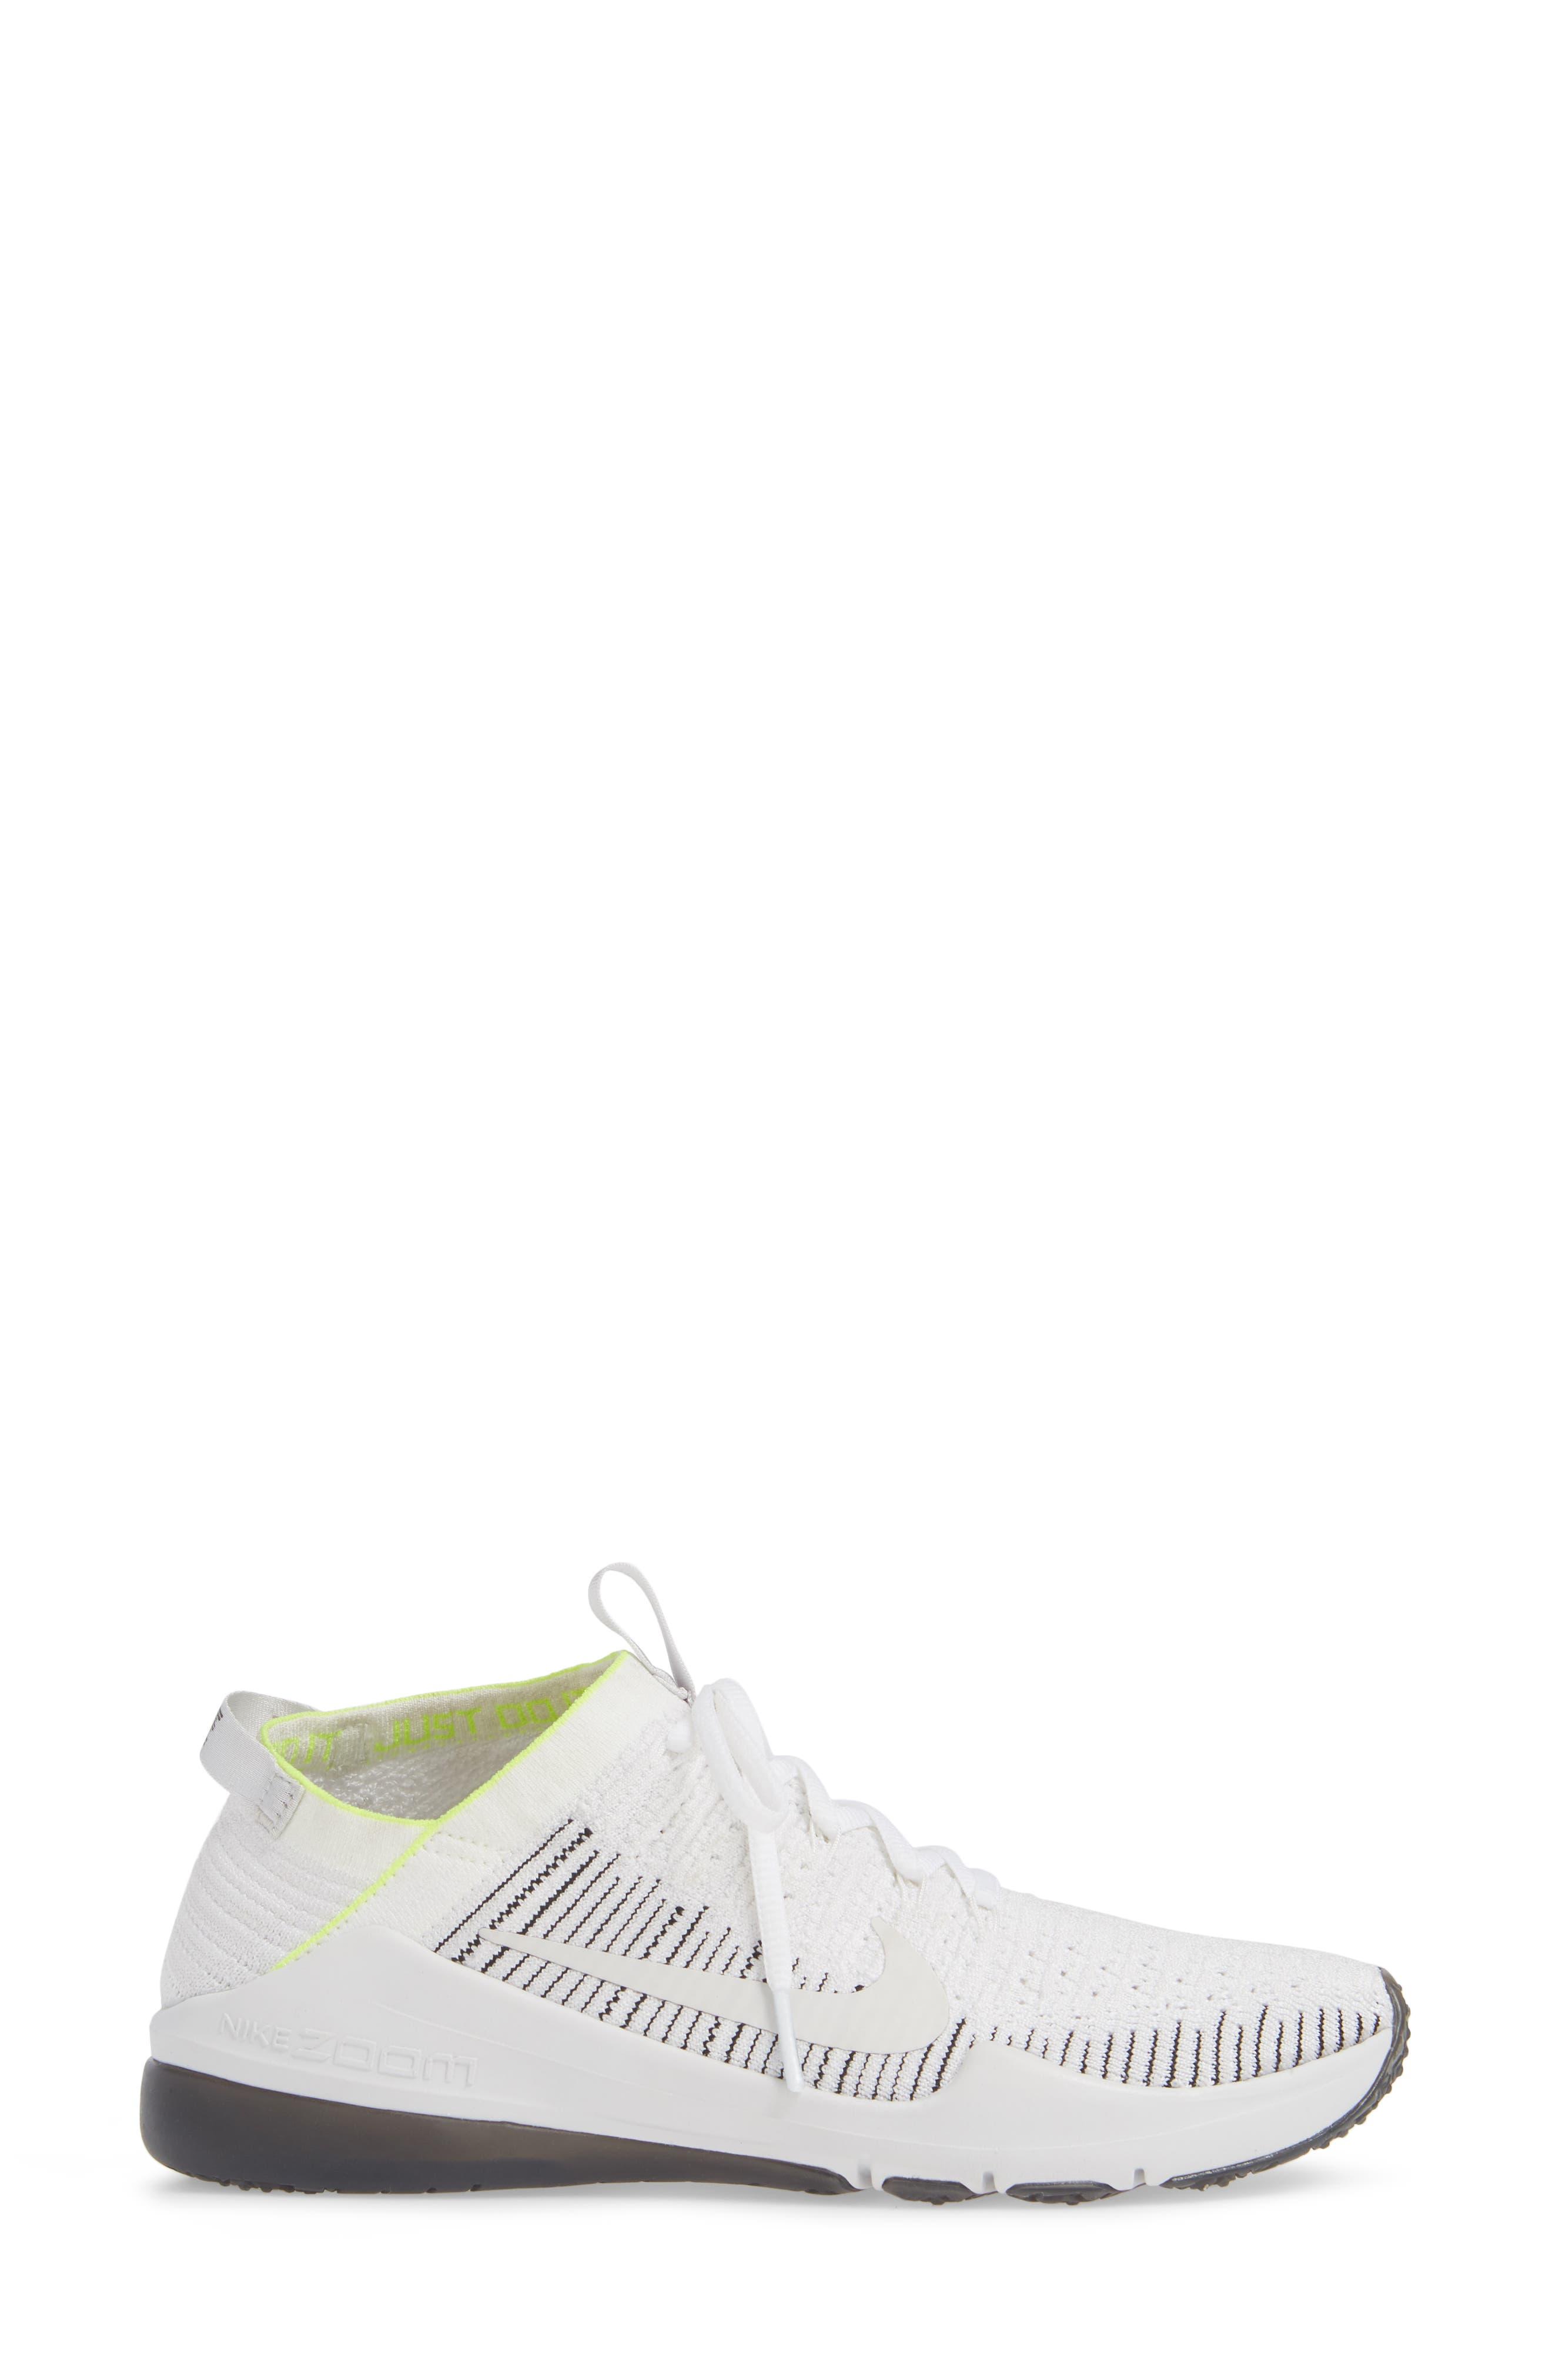 NIKE, Air Zoom Fearless Flyknit 2 Training Sneaker, Alternate thumbnail 3, color, WHITE/ PLATINUM TINT/ BLACK